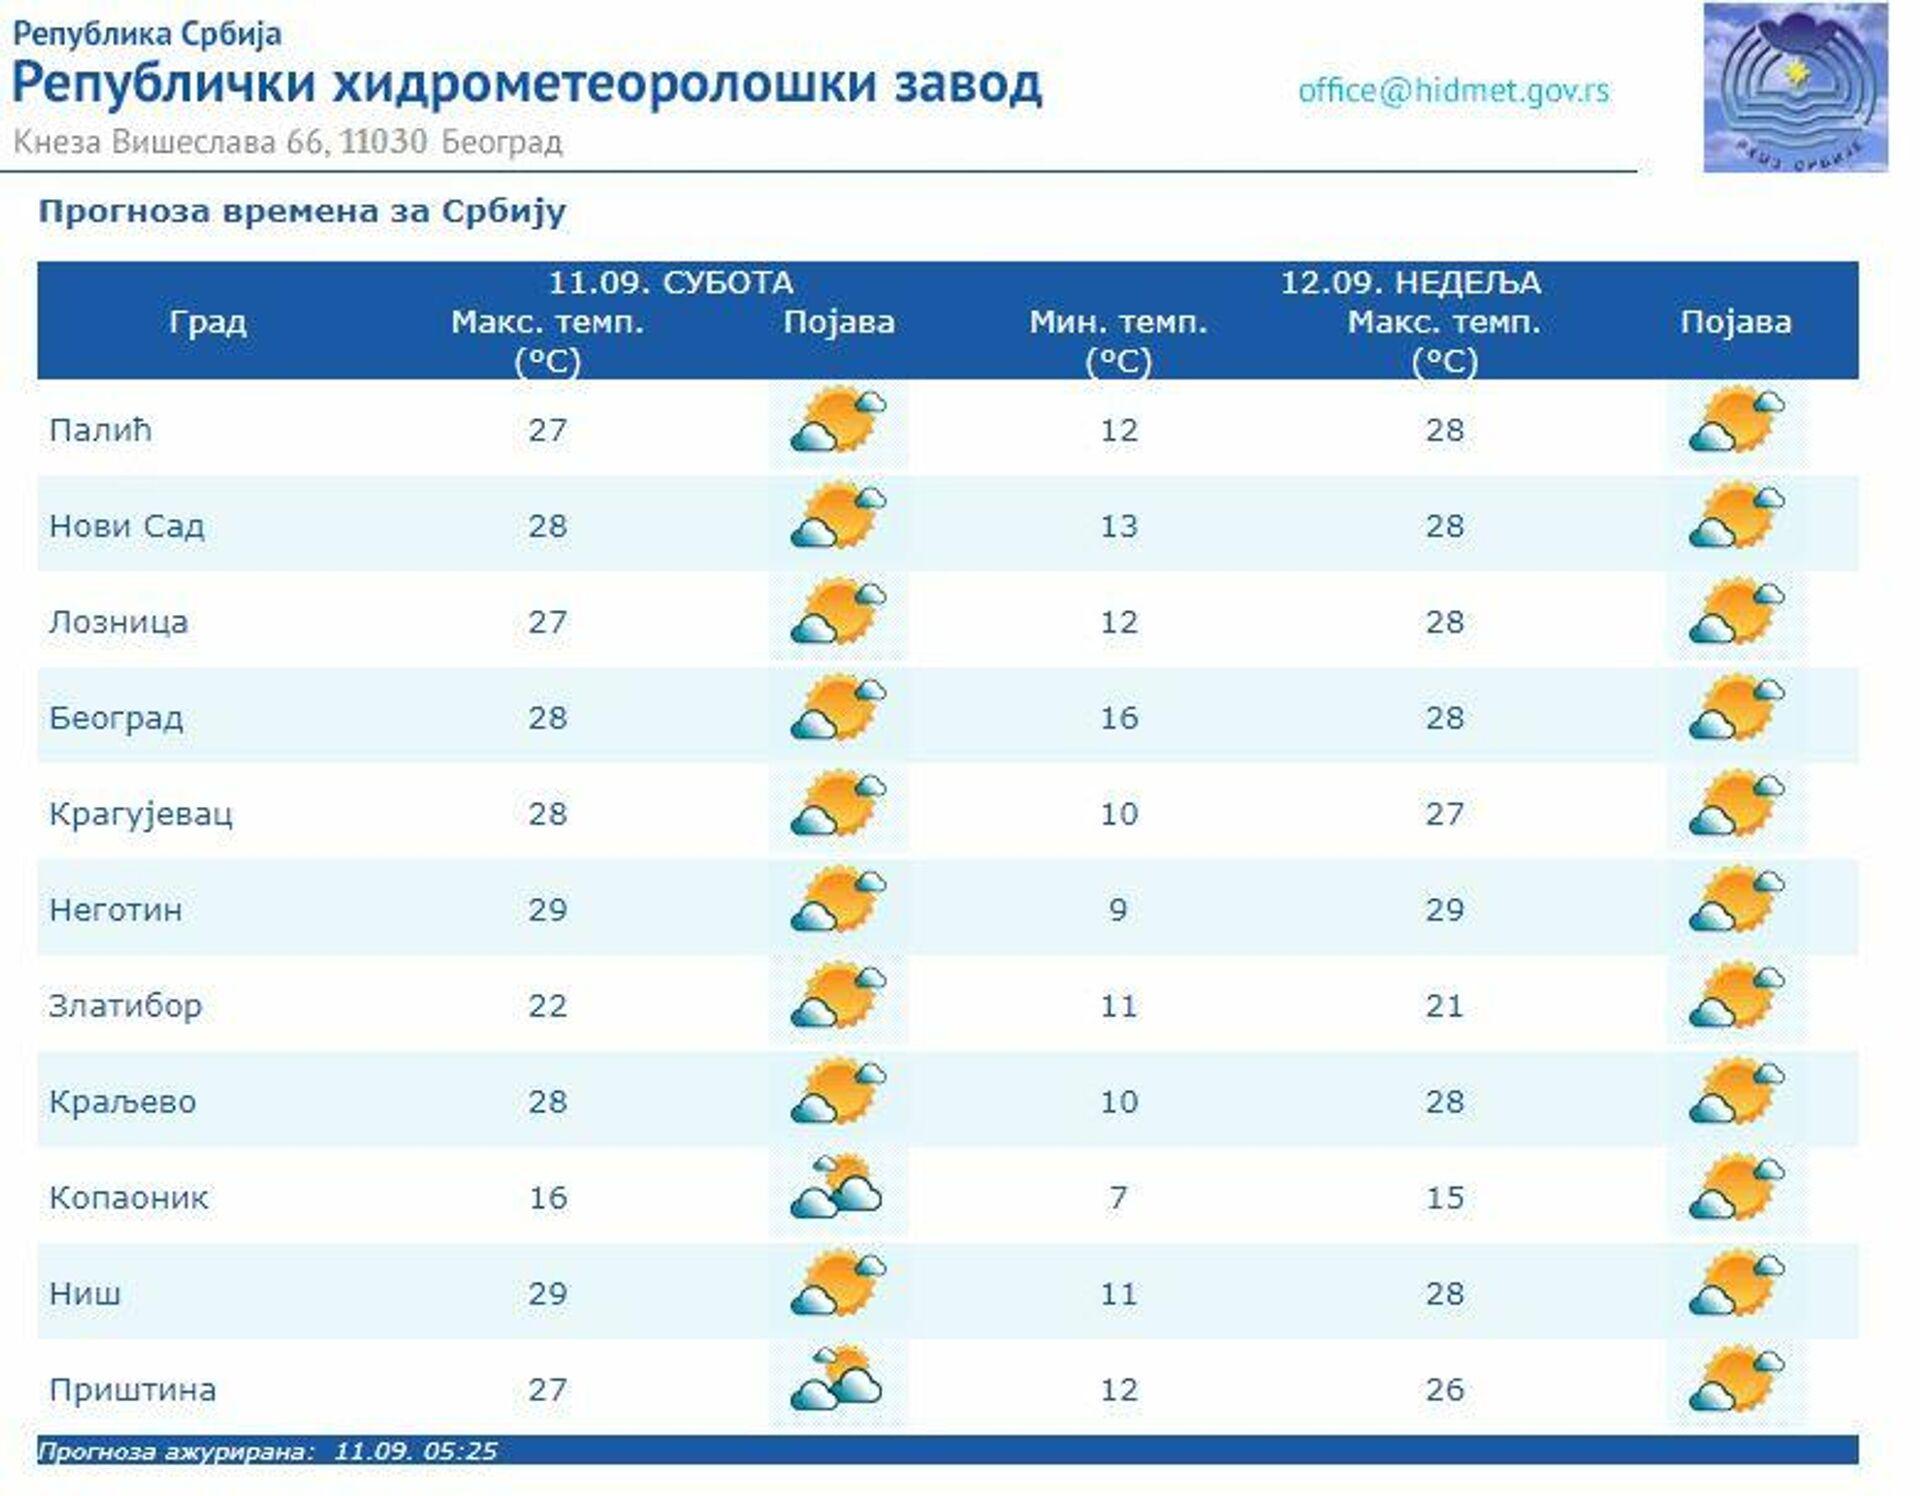 Vremenska prognoza za 11. 9. 2021. - Sputnik Srbija, 1920, 11.09.2021